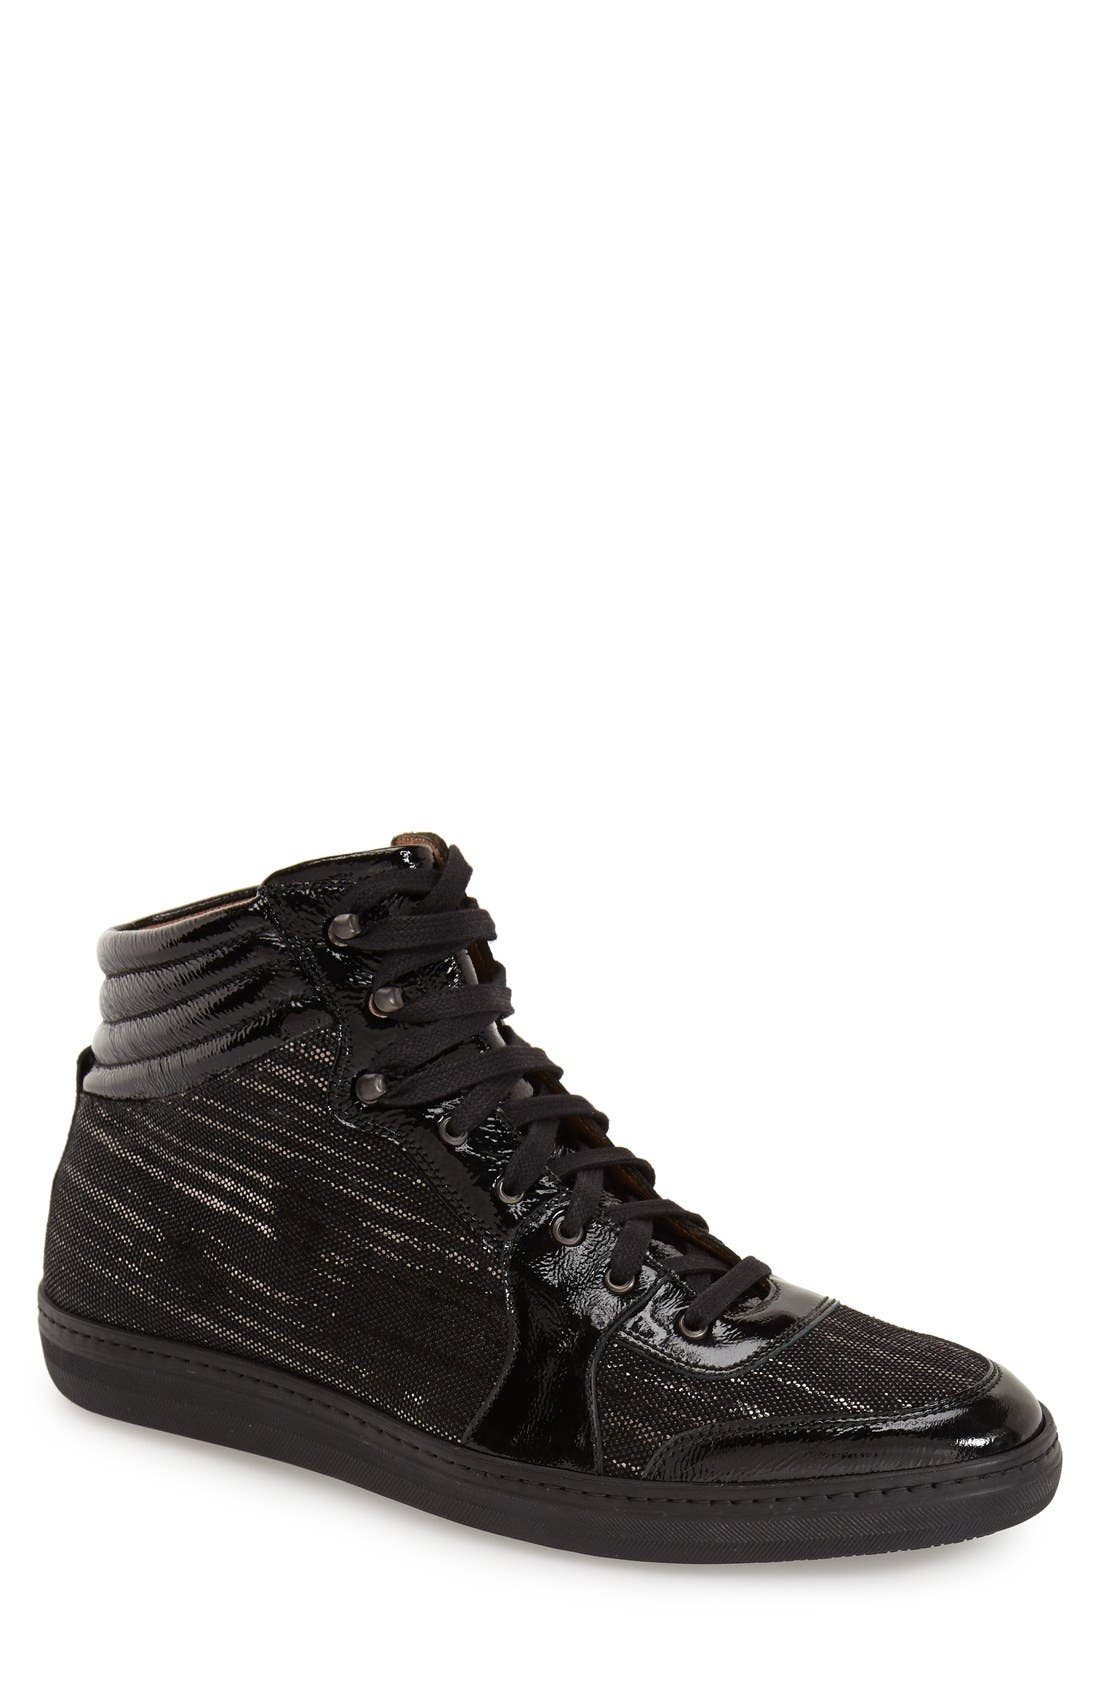 'Bordeau' Sneaker,                         Main,                         color, 001